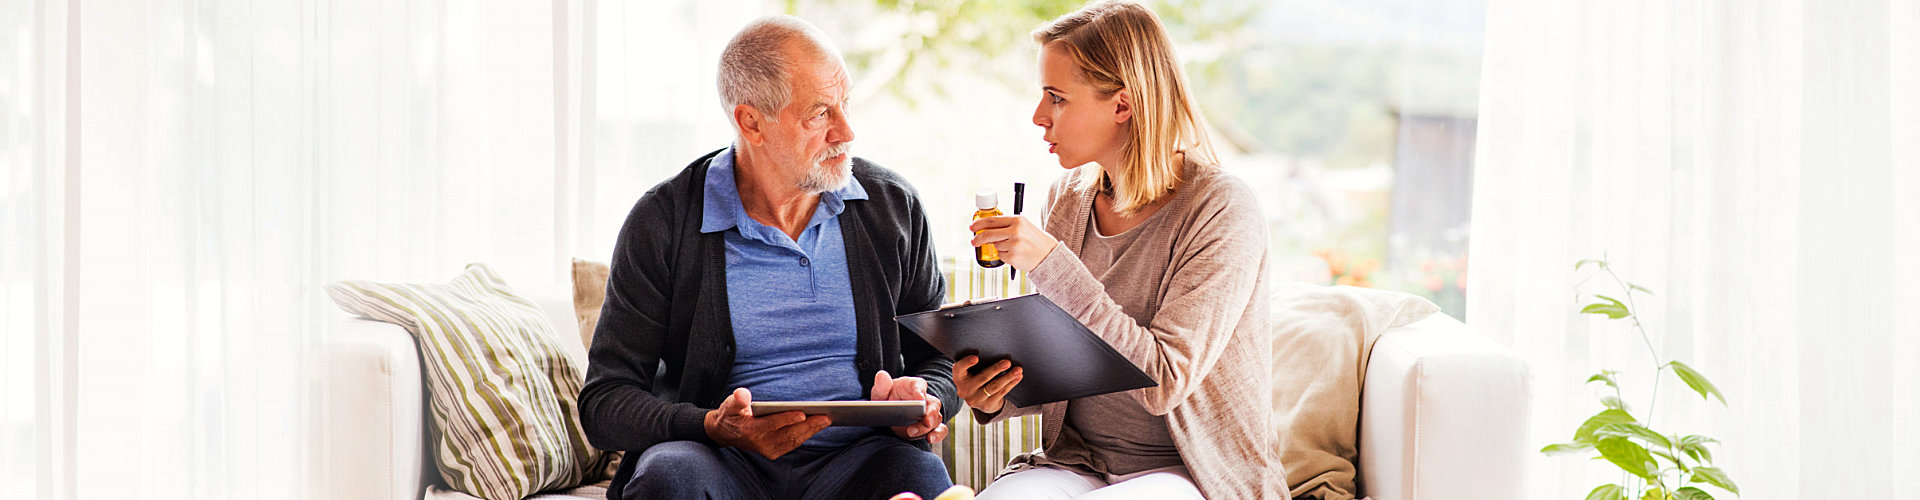 woman reminding senior of his medicine